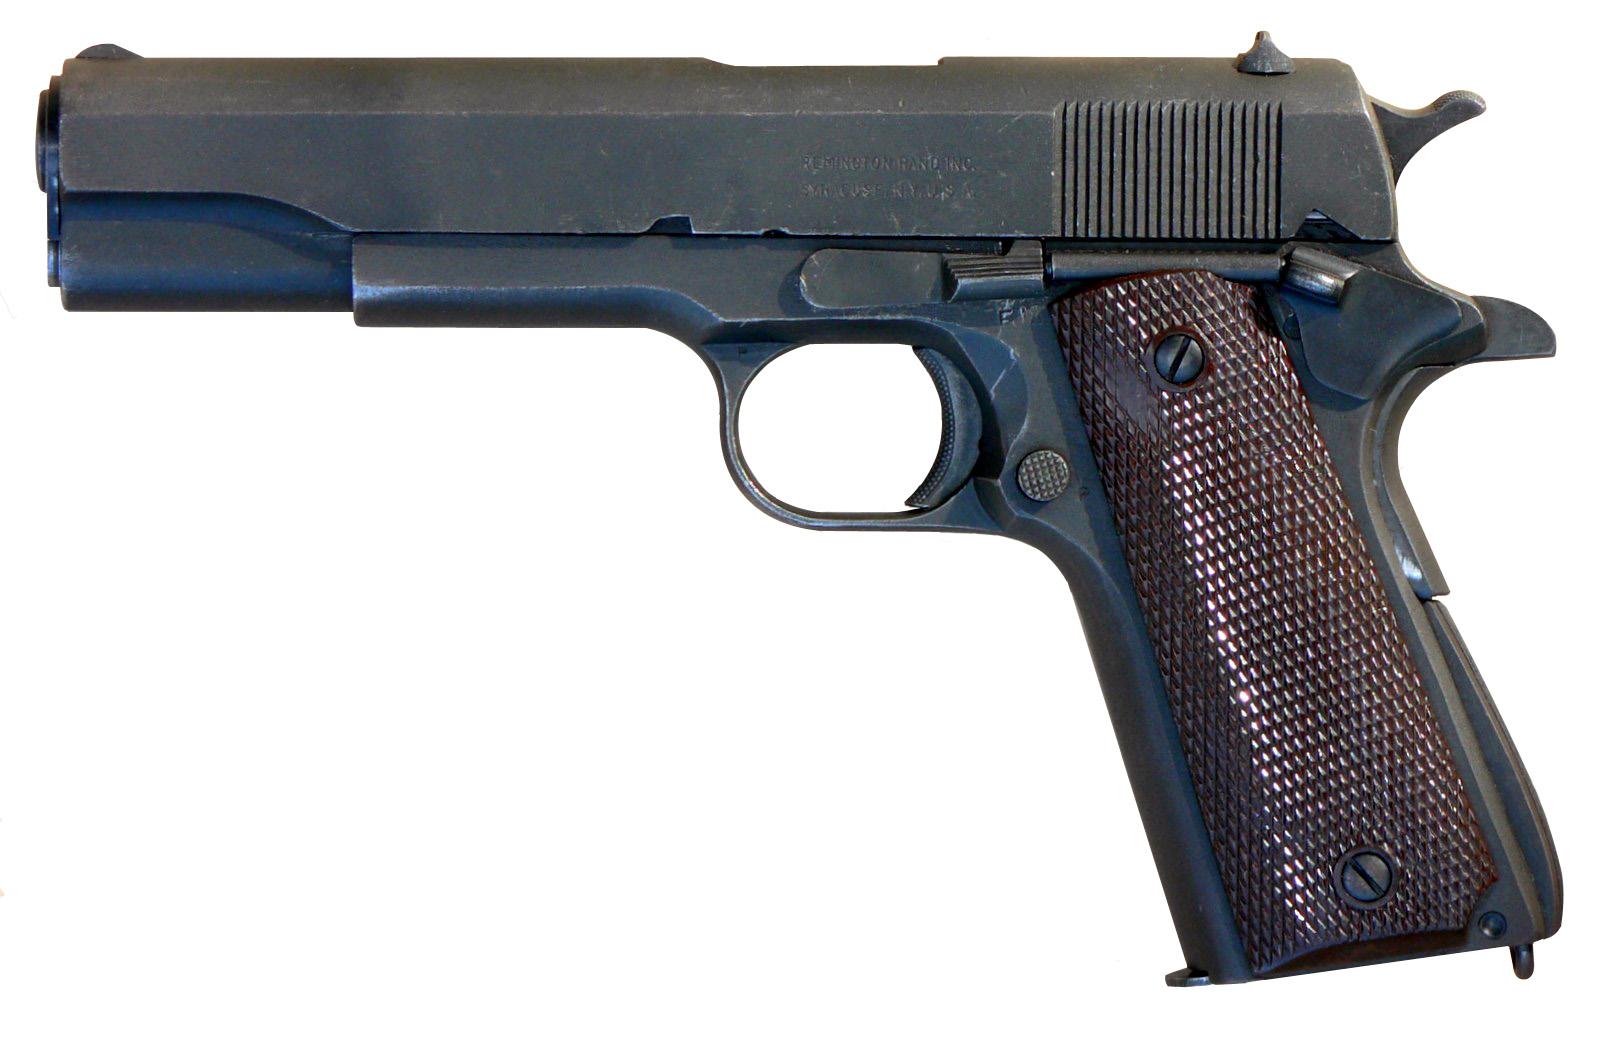 M1911A1 Pistol, image courtesy M62